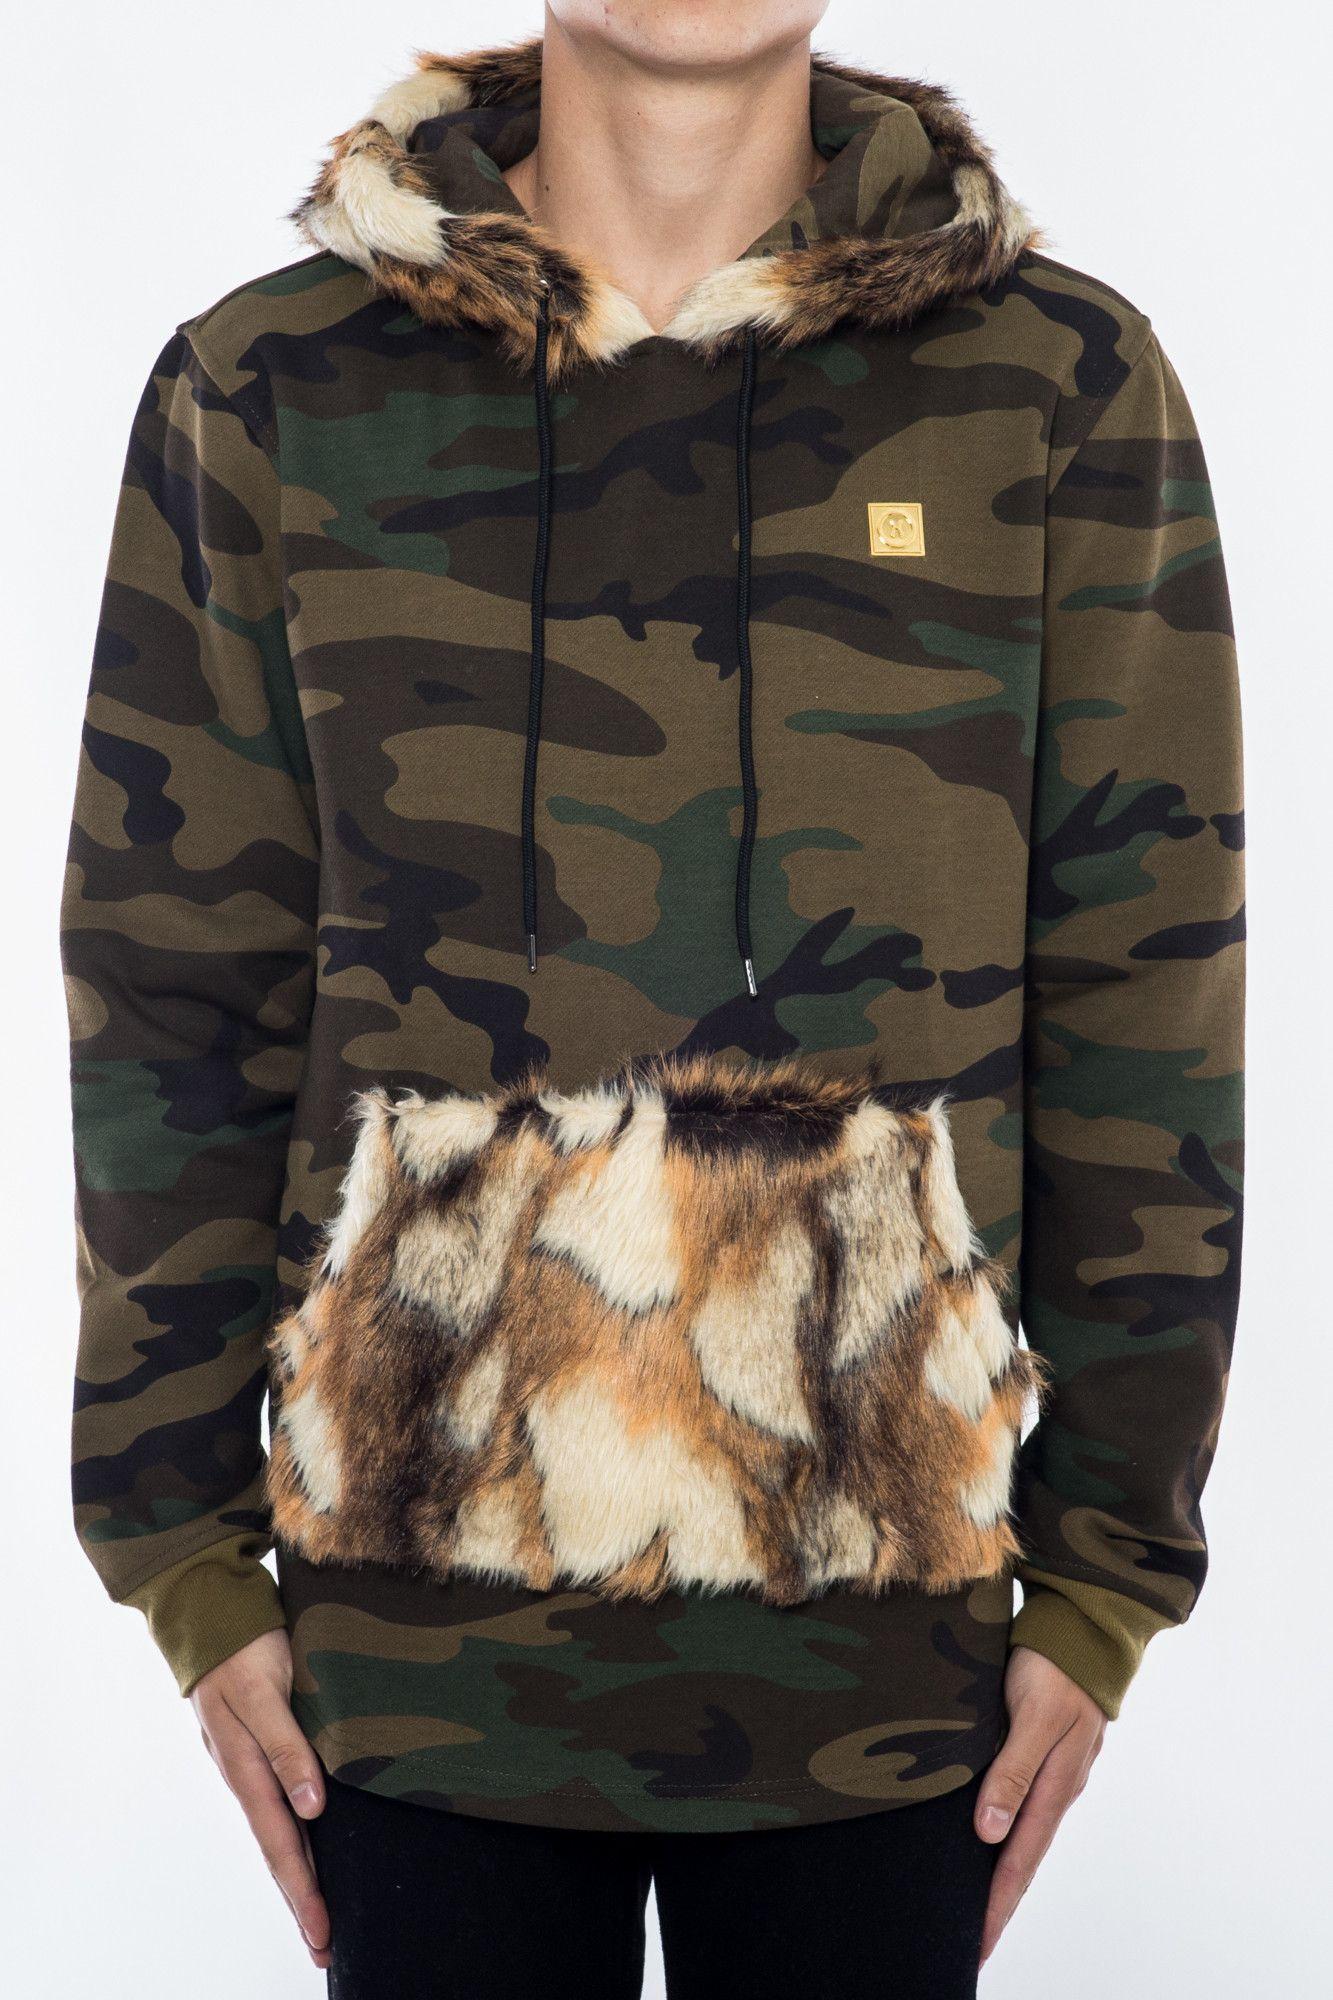 Fur Hoody Camo From Hudson Outerwear Hoodie Fashion Sweatshirts Hoodie Hoodies [ 2000 x 1333 Pixel ]